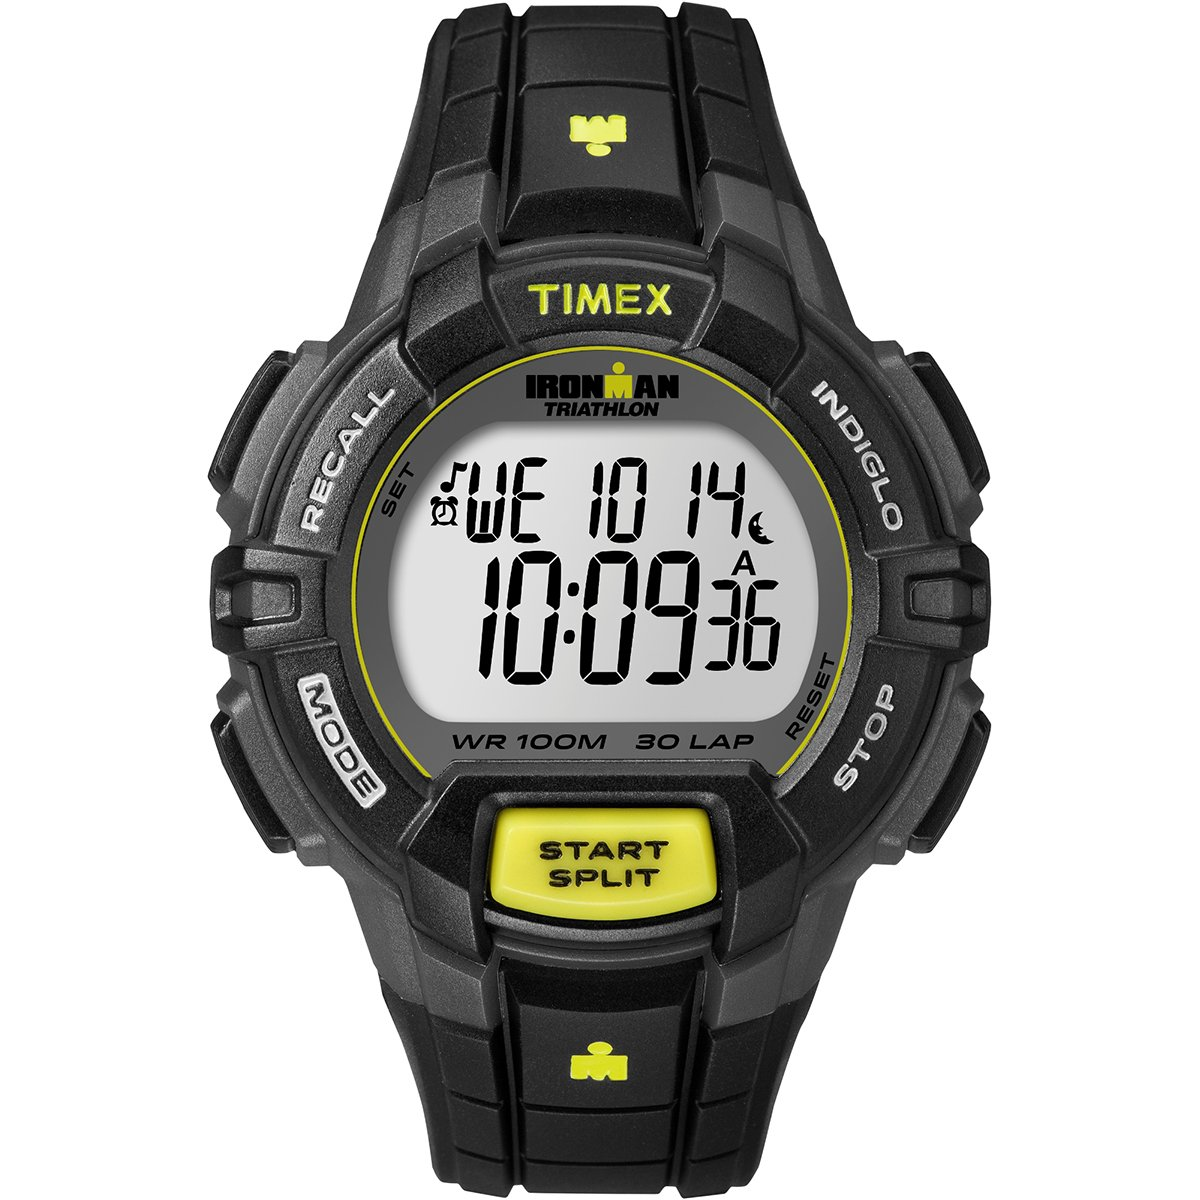 c3716481aa8 Relógio Timex Ironman T5K790WKLTN - Compre Agora